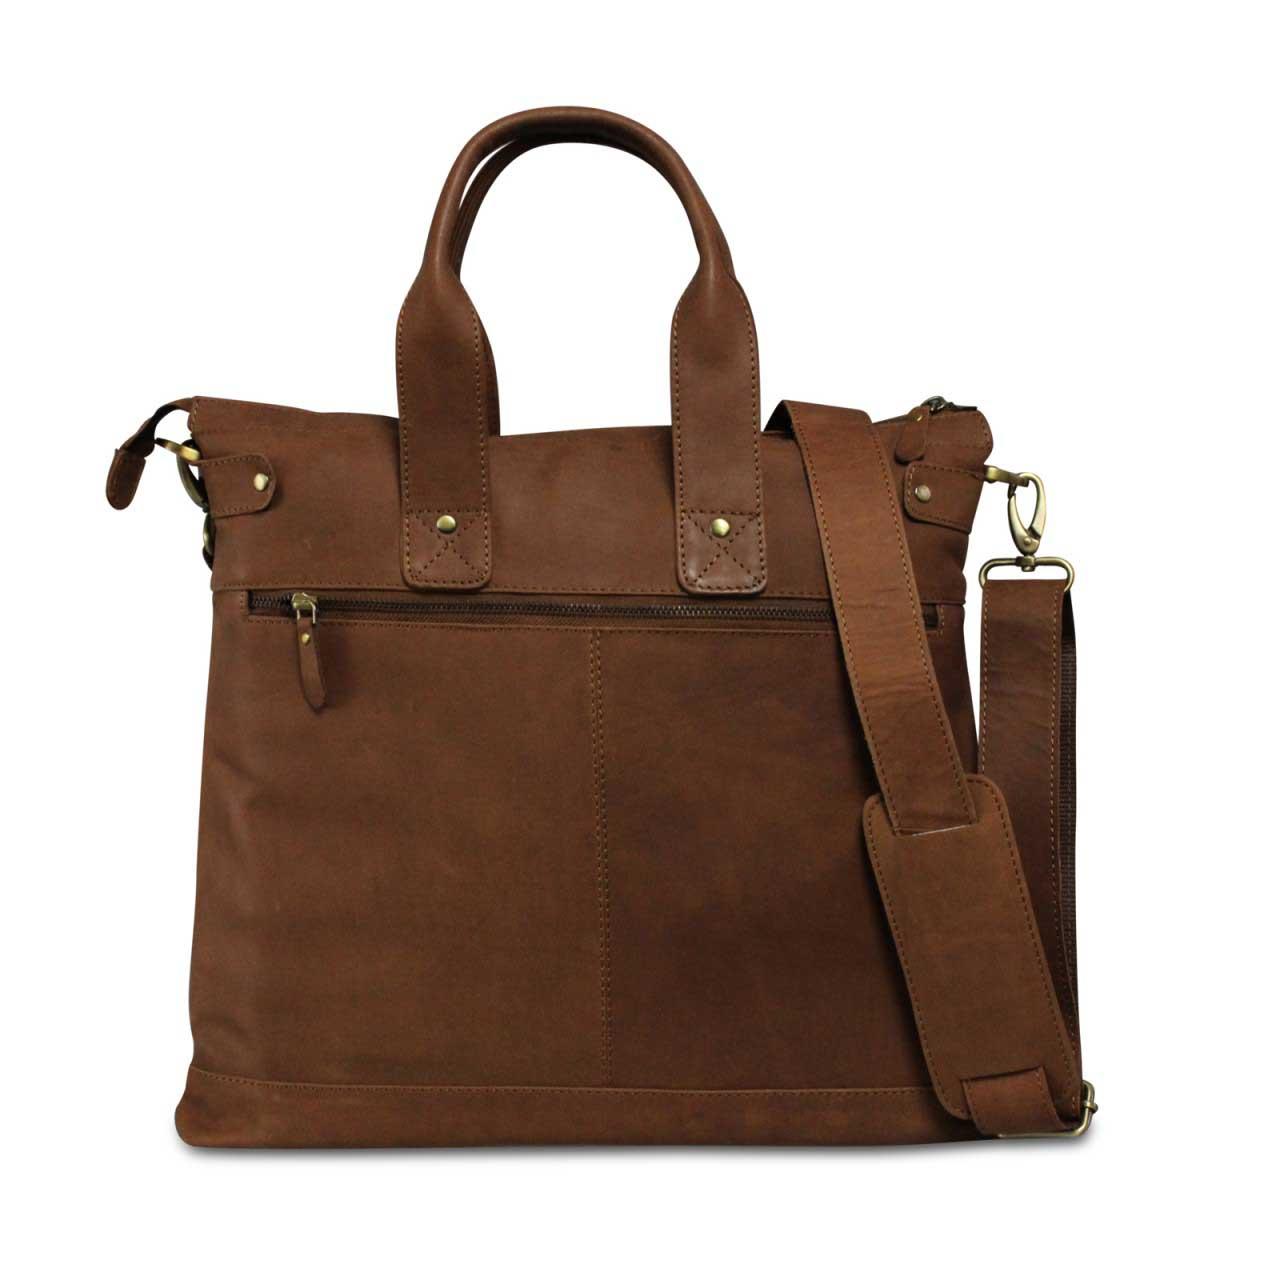 Ledertasche Unisex Tragetasche Handbag Leder